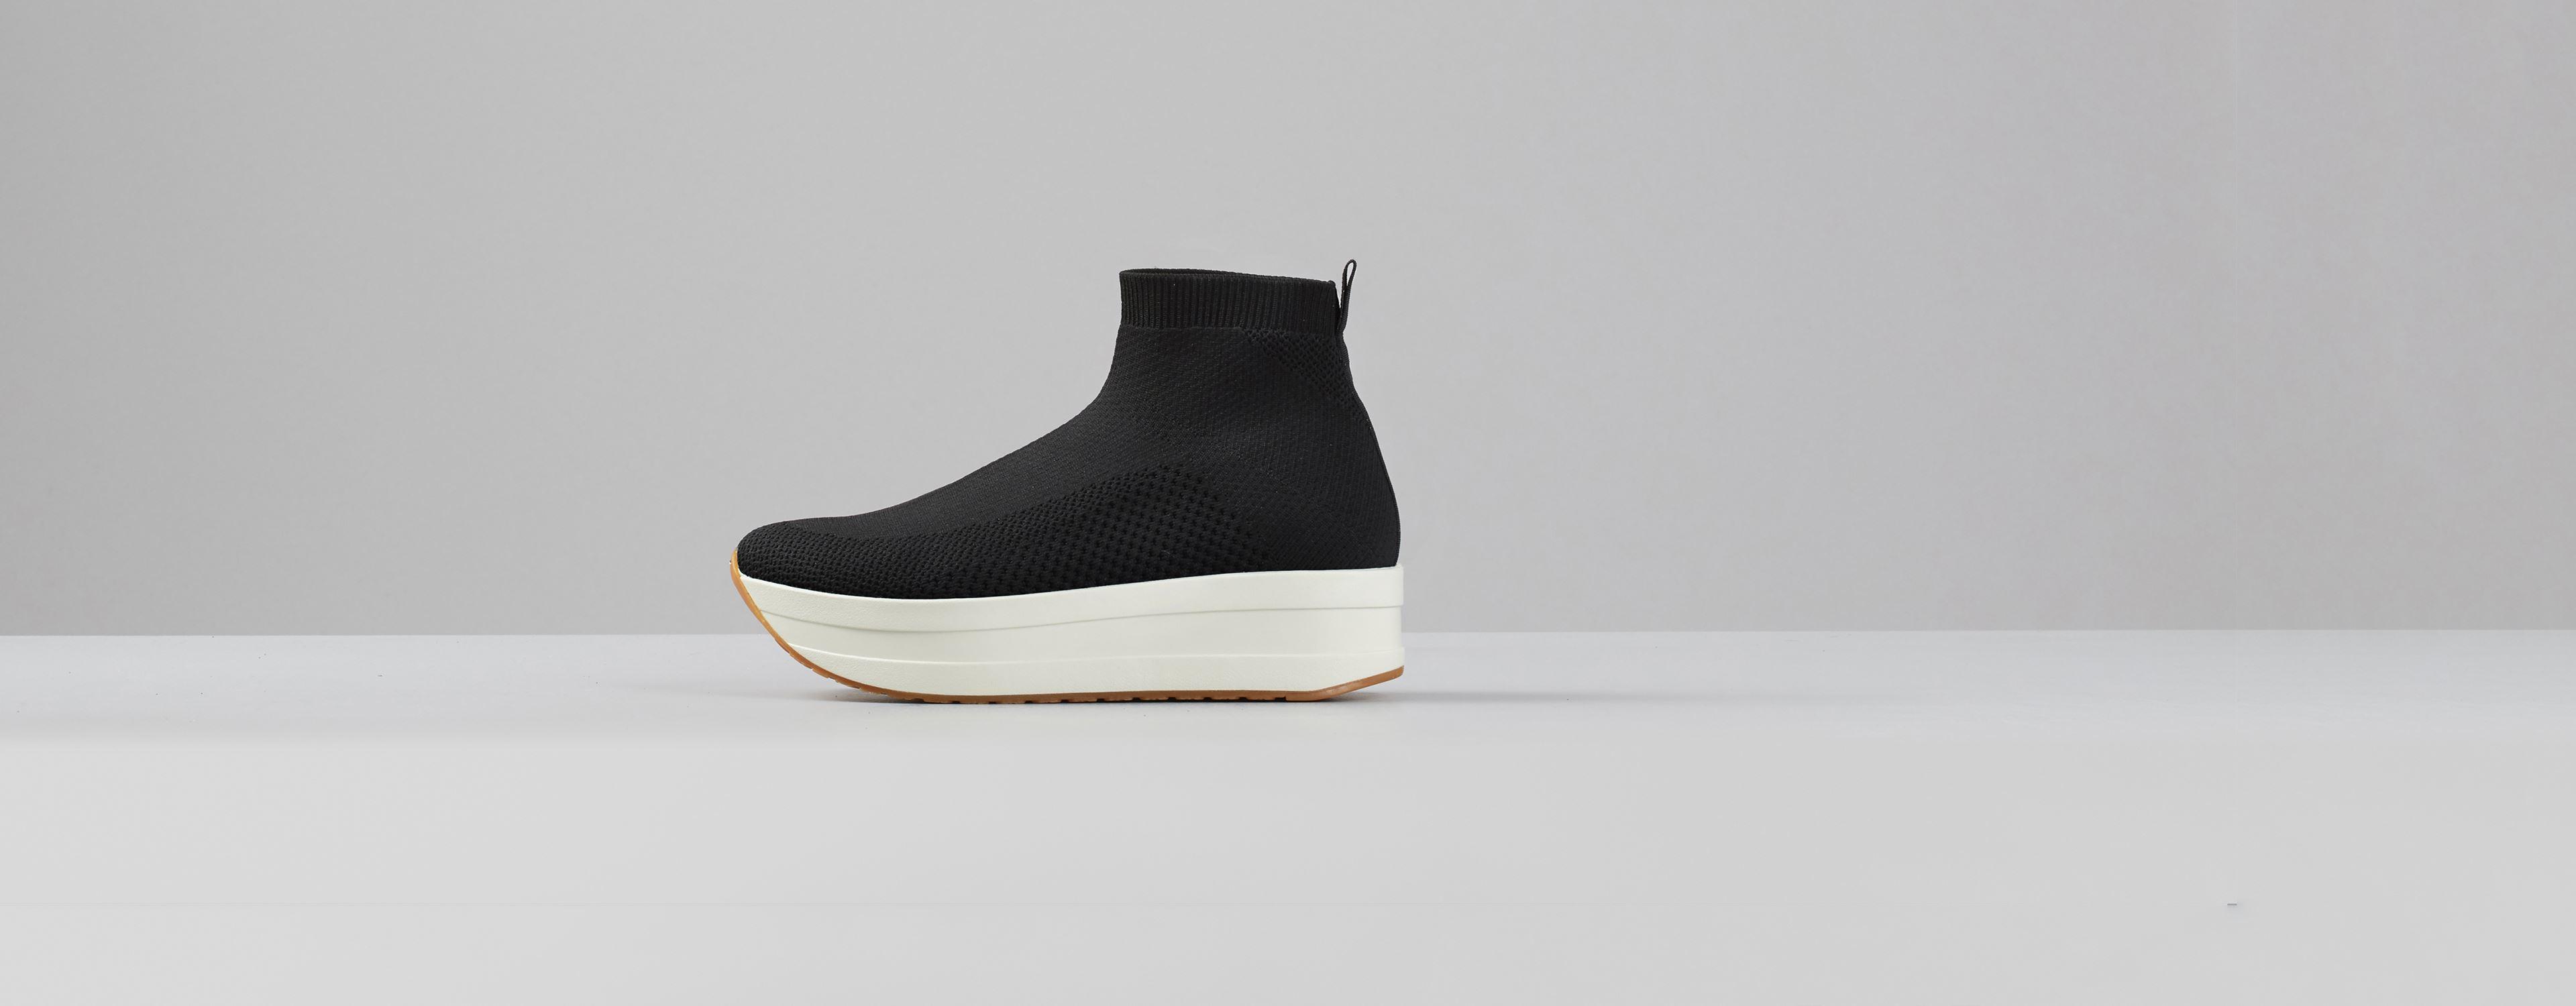 6. kép: Cipő Vagabond 100 EUR